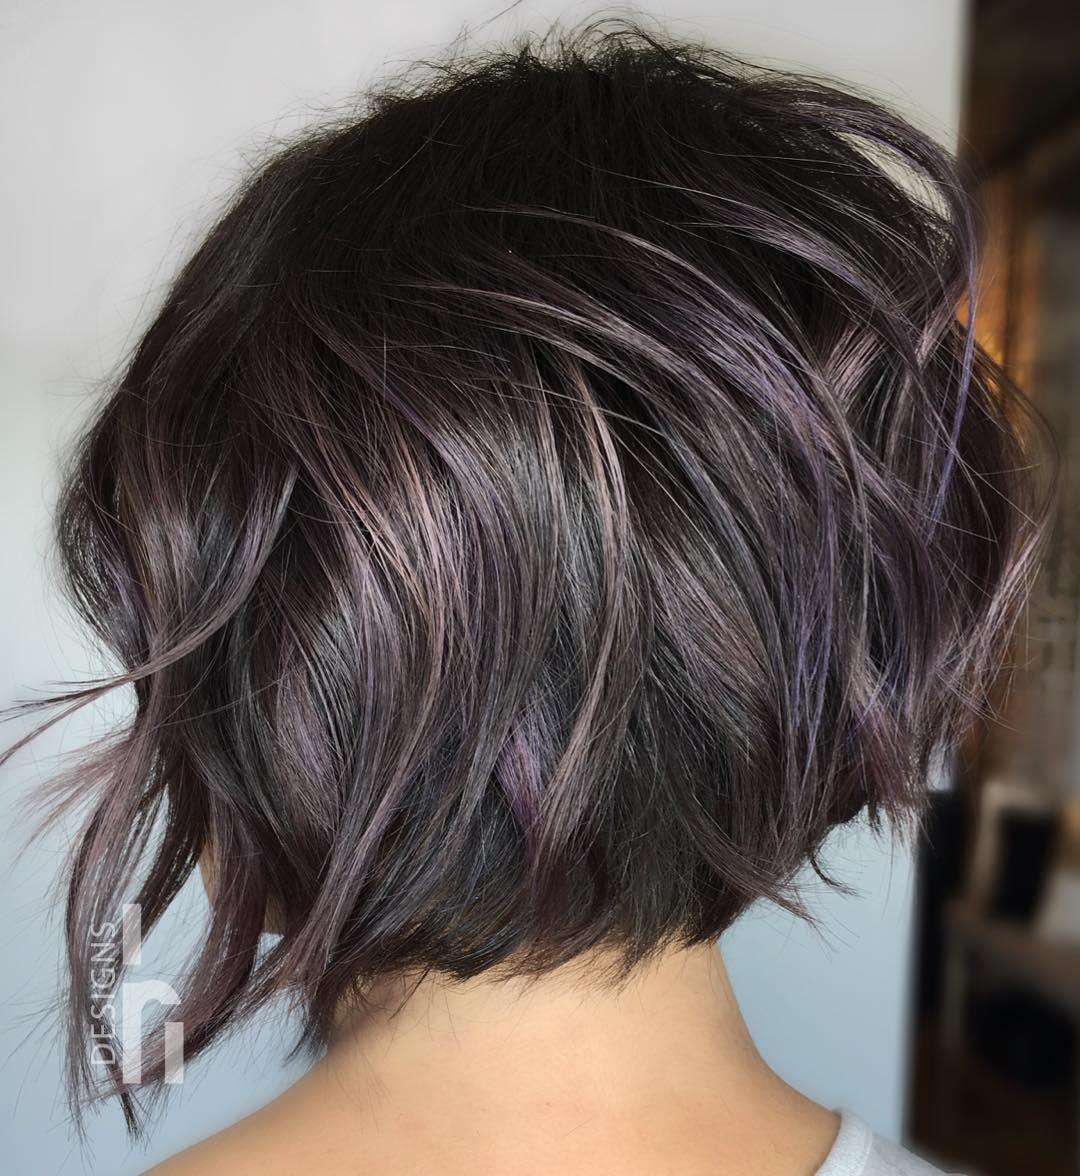 Short Choppy Purple Brown Bob Hairstyle